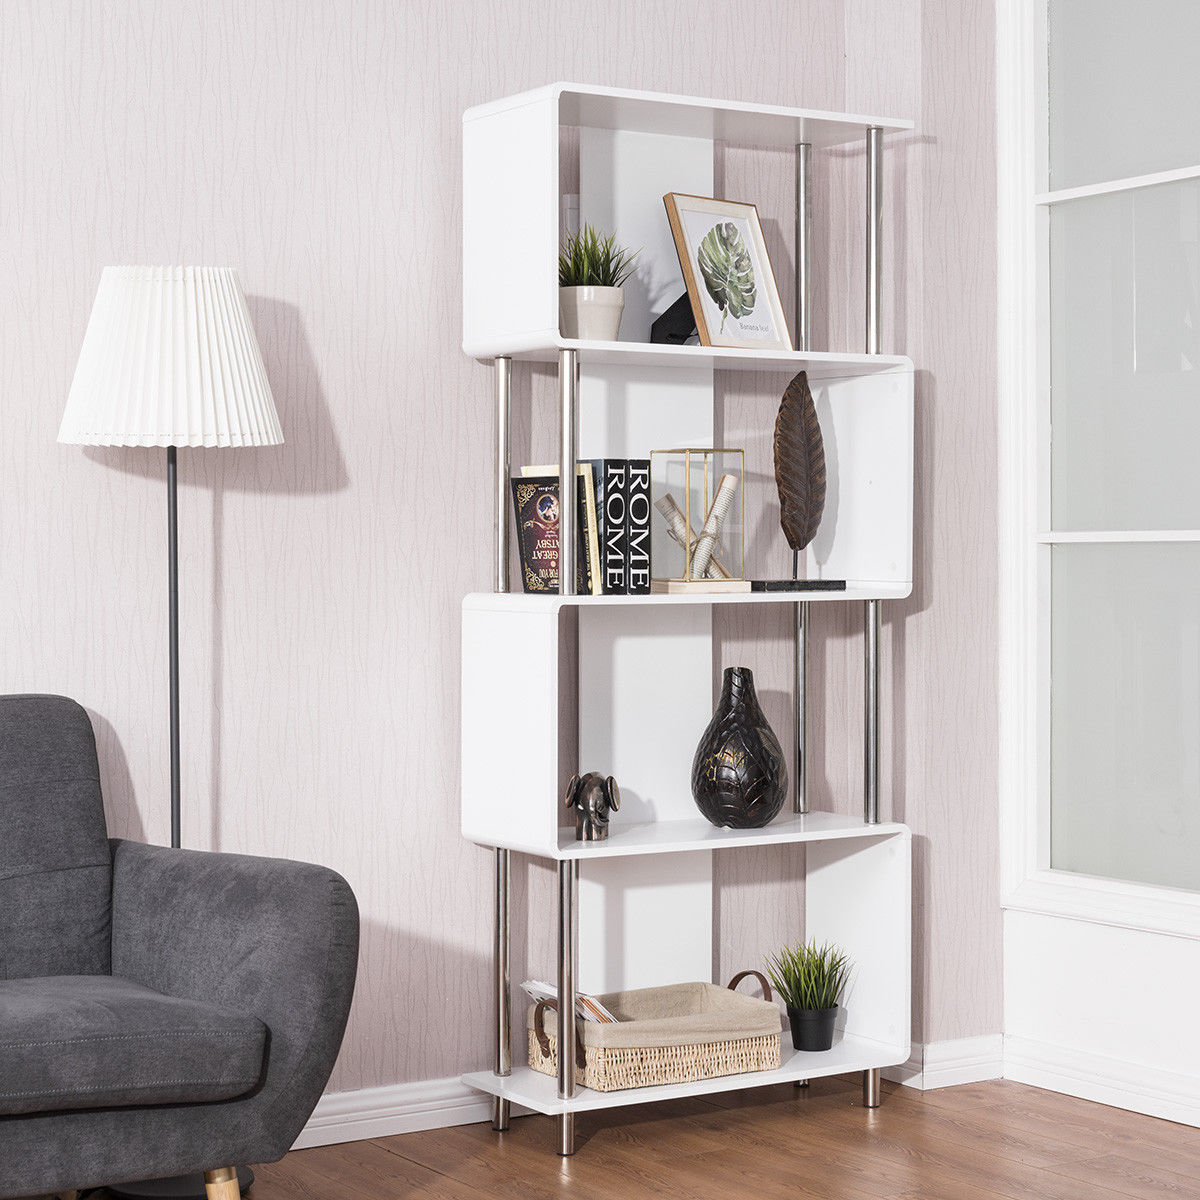 Us 92 99 Giantex Industrial Style 4 Shelf Modern Bookcase Living Room Storage Display Unit Bookshelf White Home Furniture Hw56698 On Aliexpress